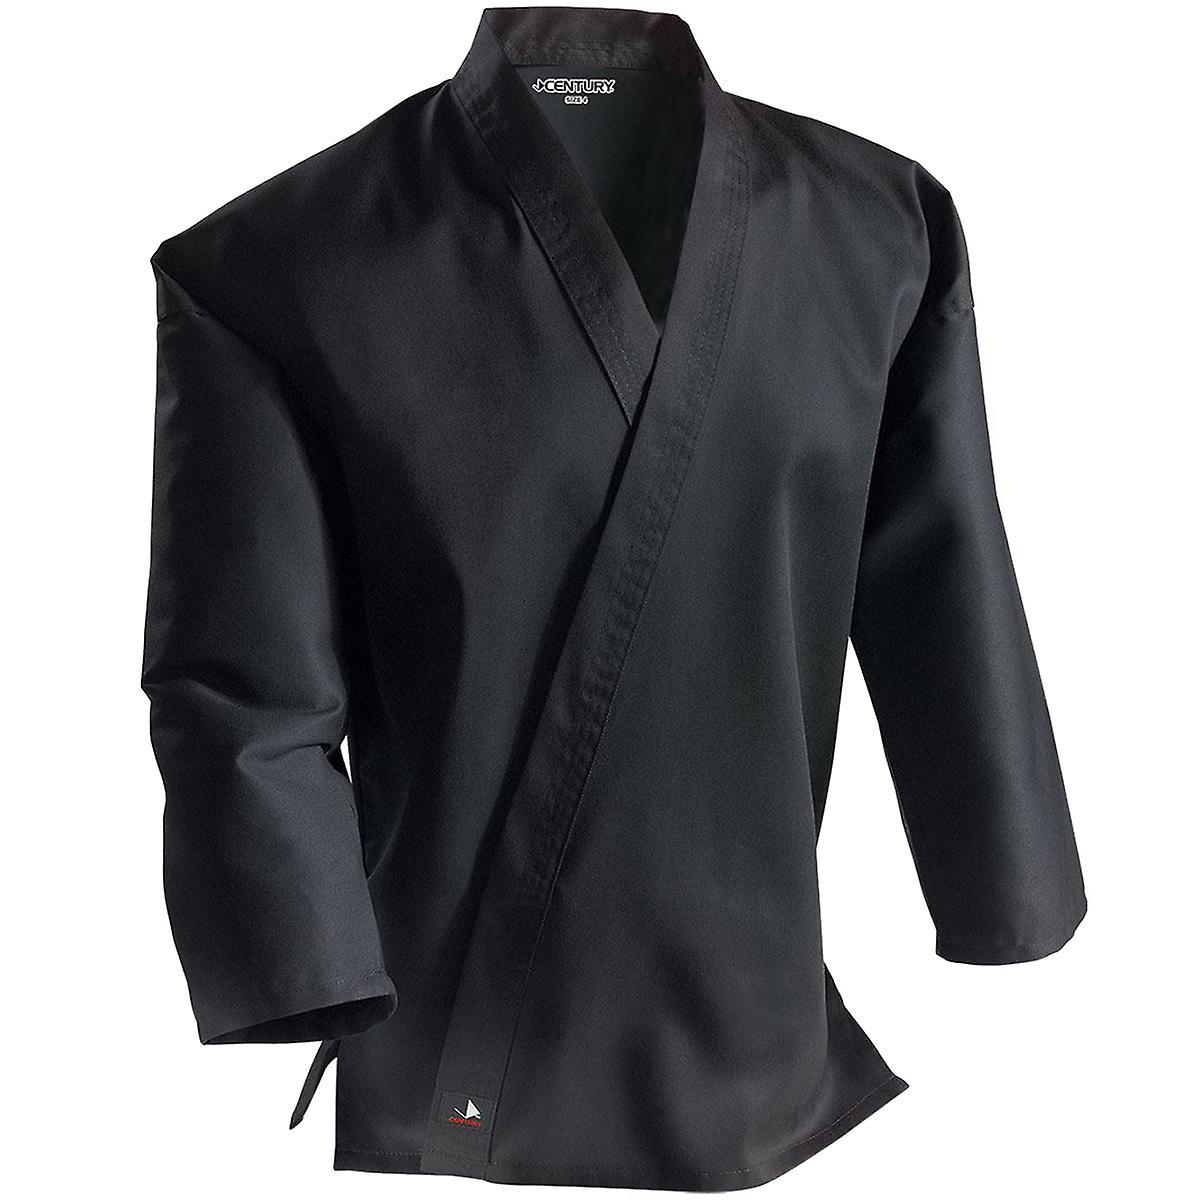 Talet Kid's 6 oz. lätta Student Uniform w / elastisk byxor - svart - kimono